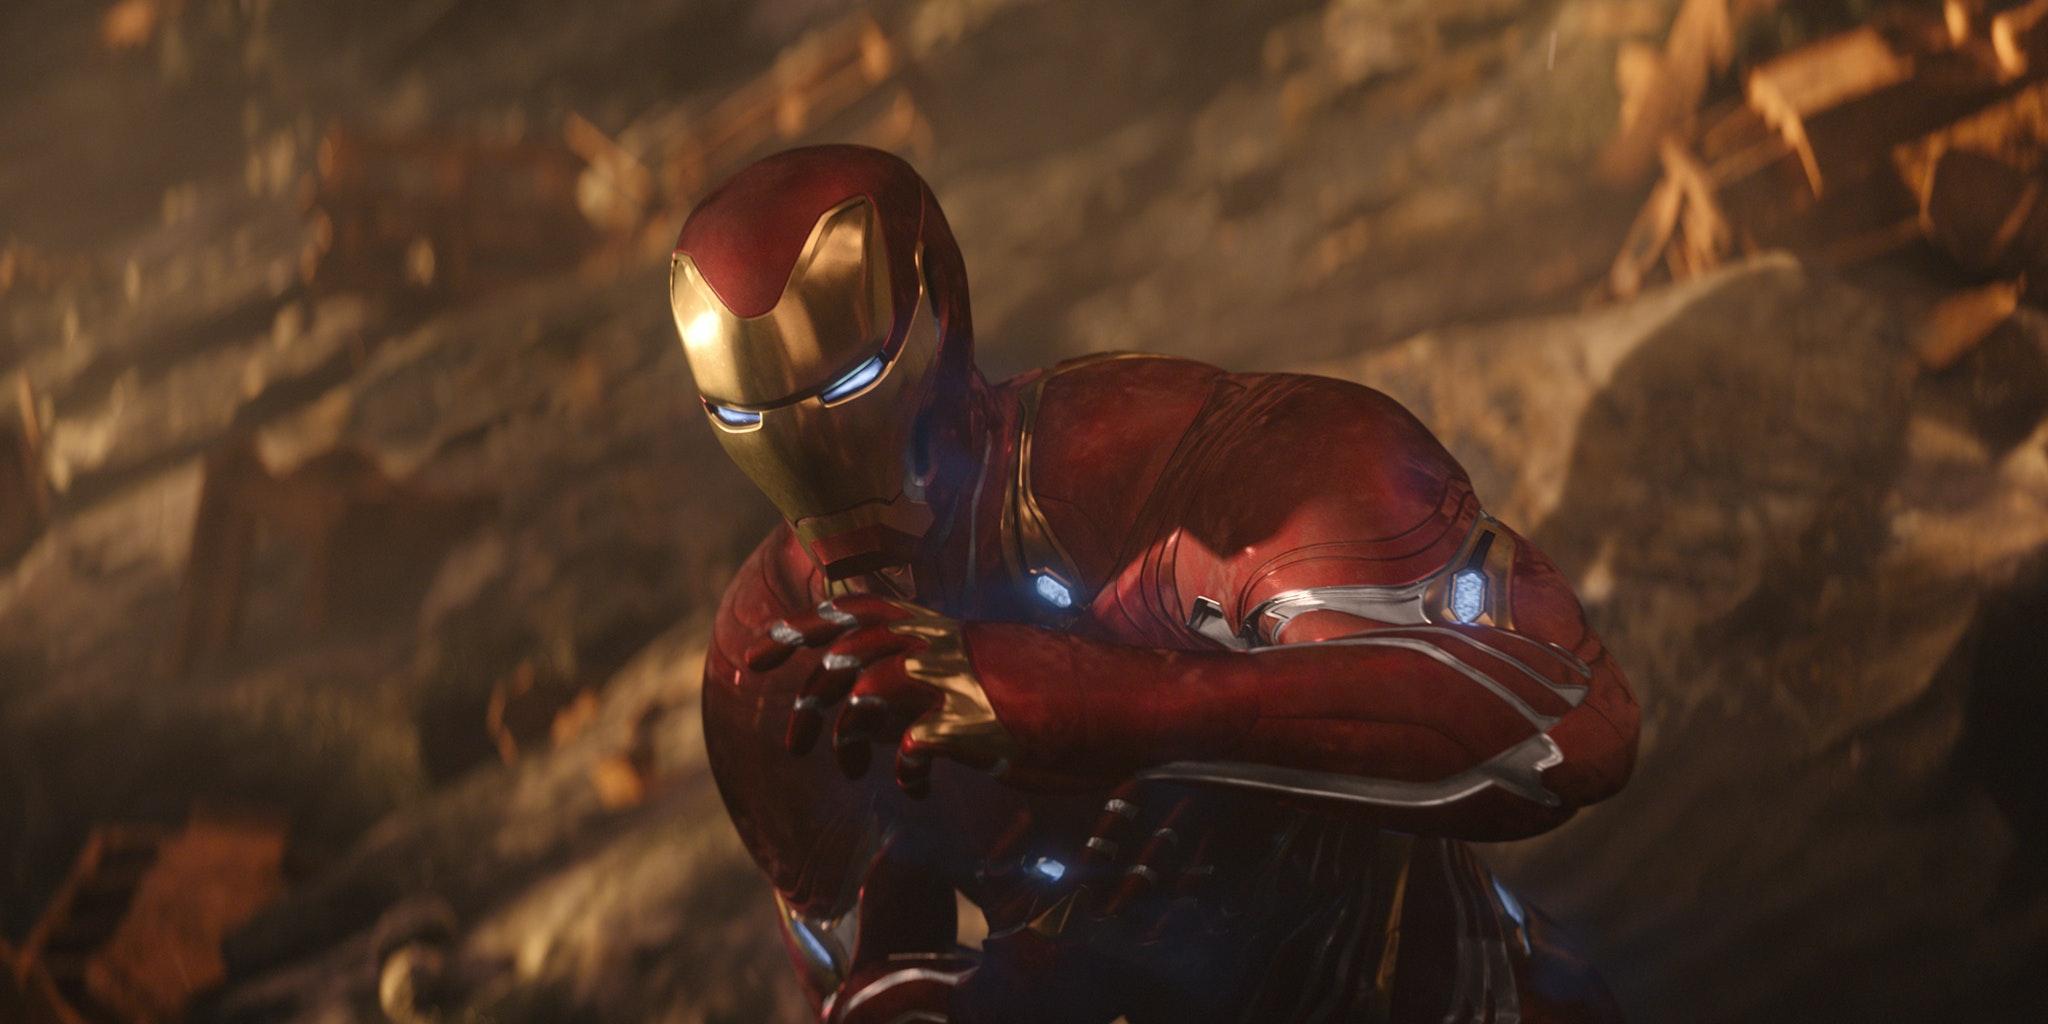 A Professor of Nuclear Physics Debunks 'Avengers 4' Proton Cannon Rumors